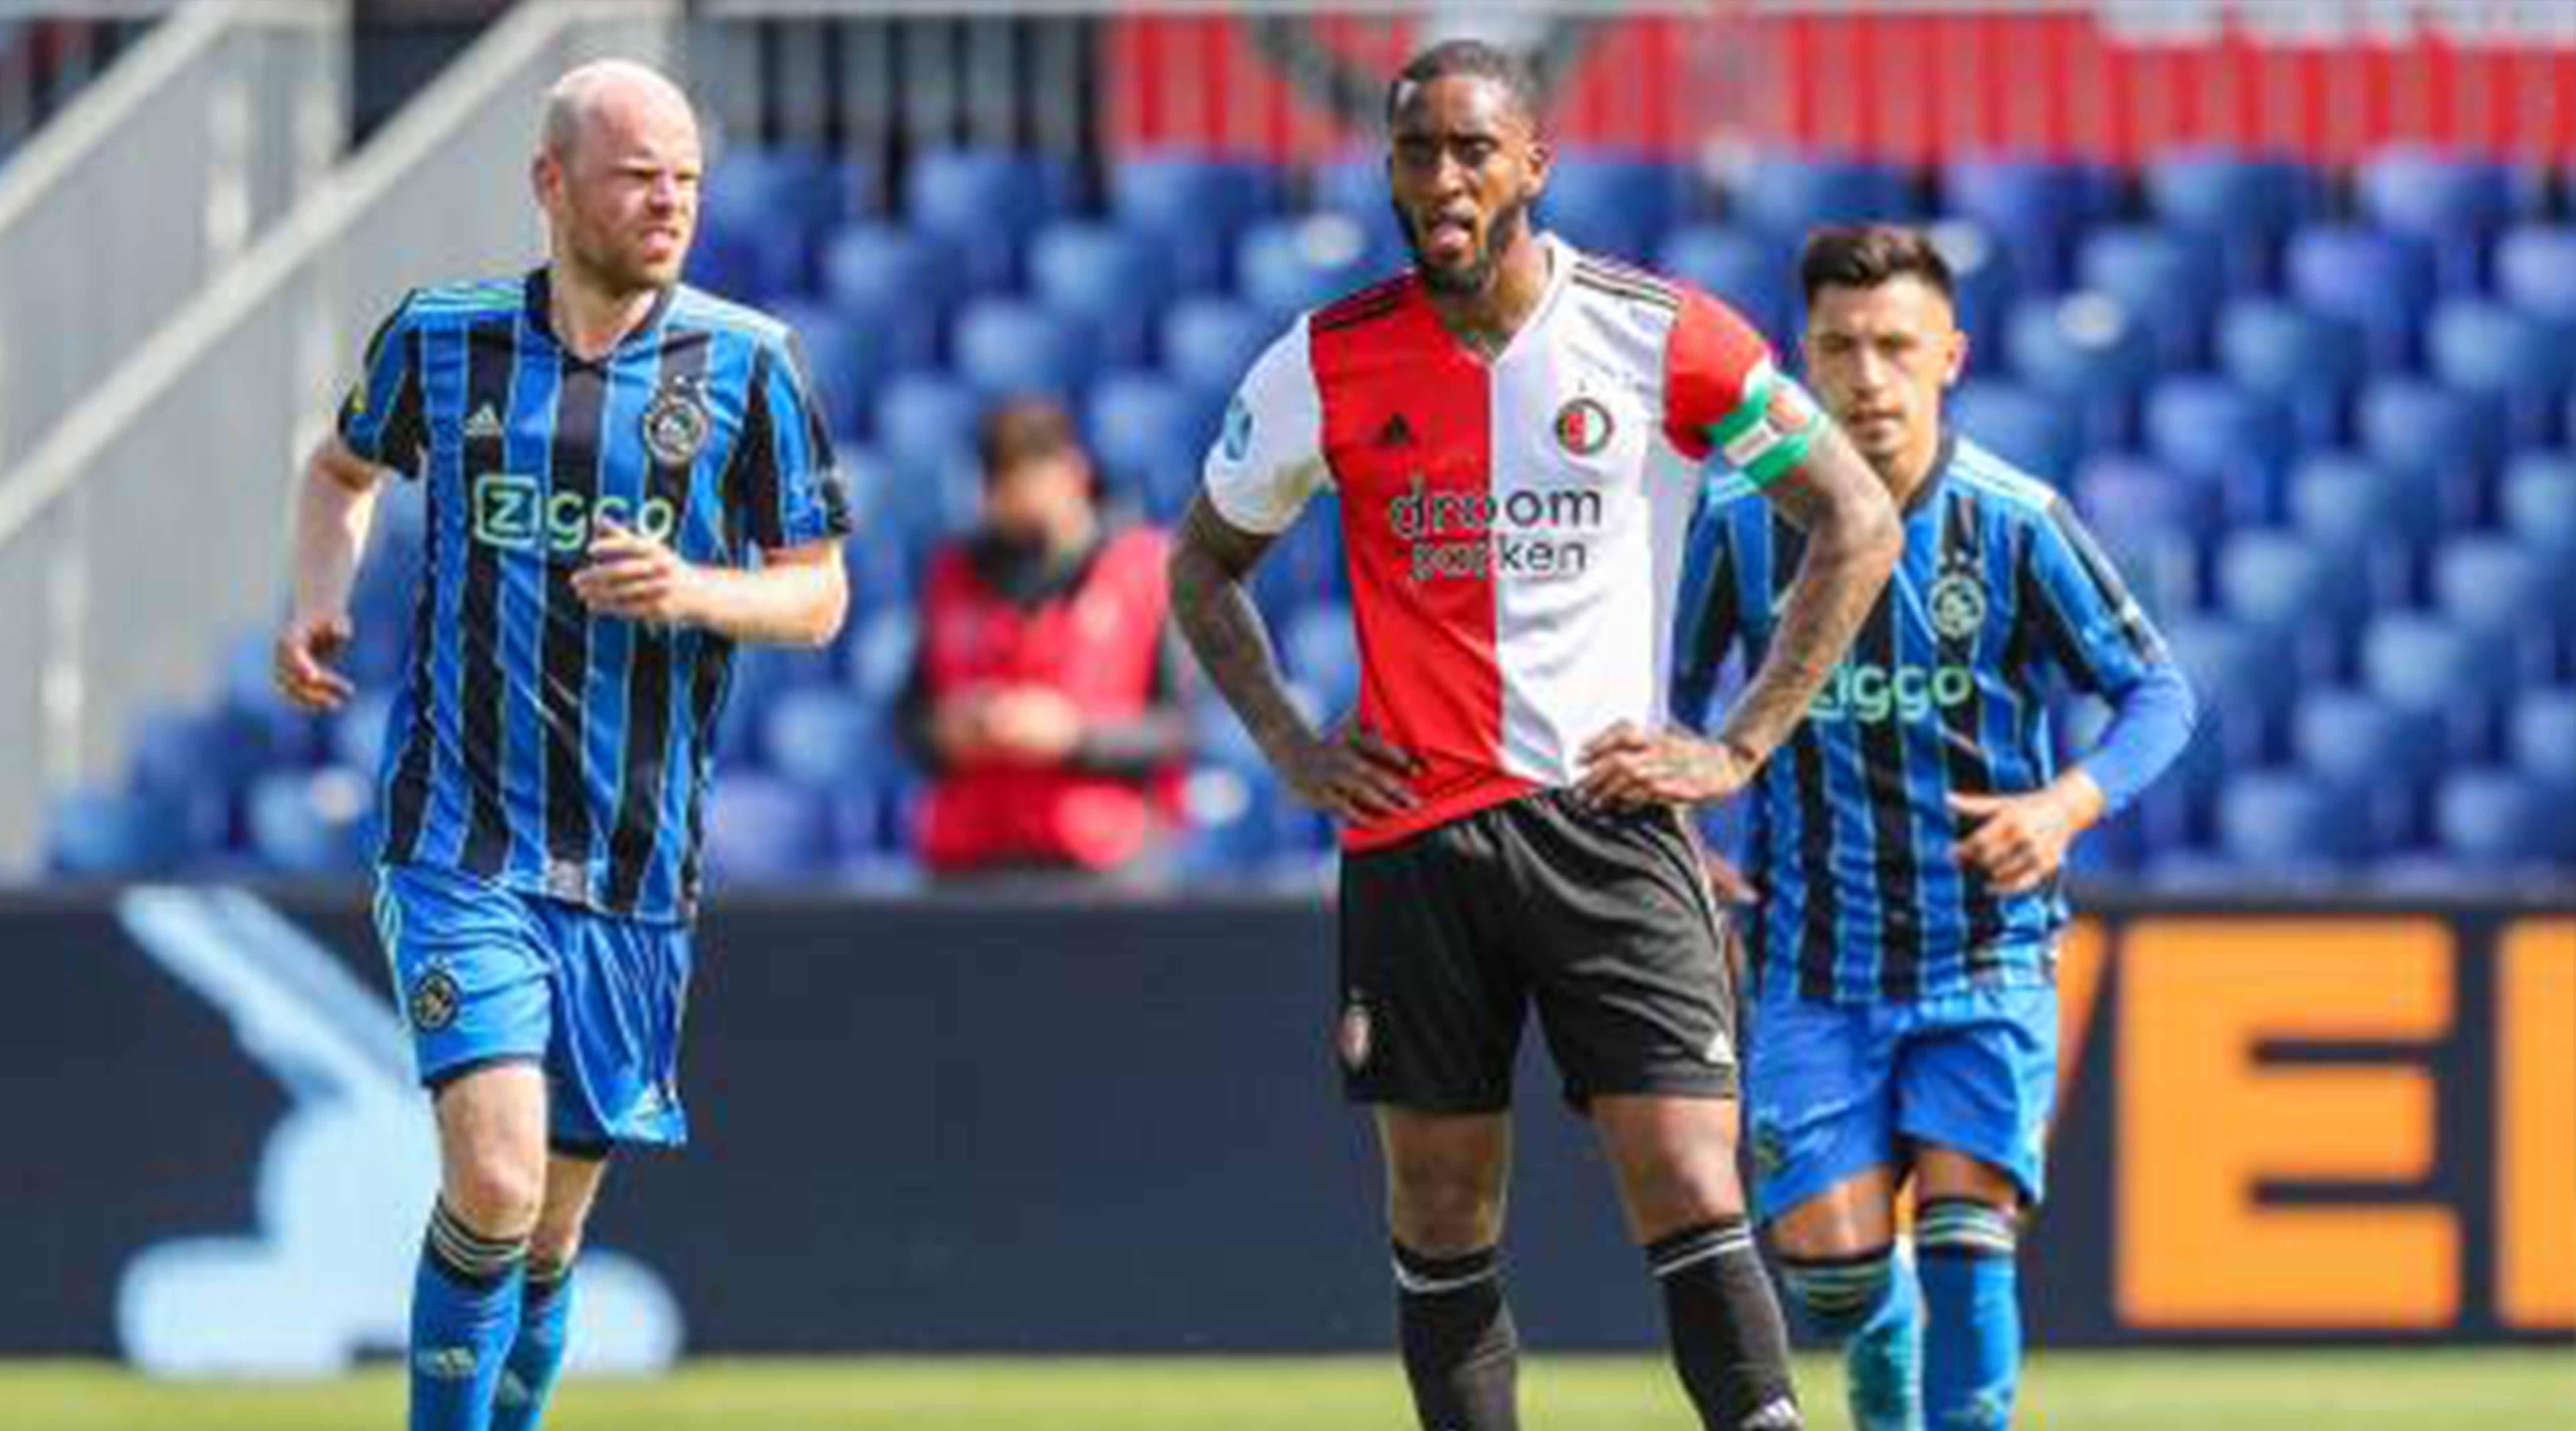 Fer maakt moedeloze indruk na nederlaag tegen Ajax